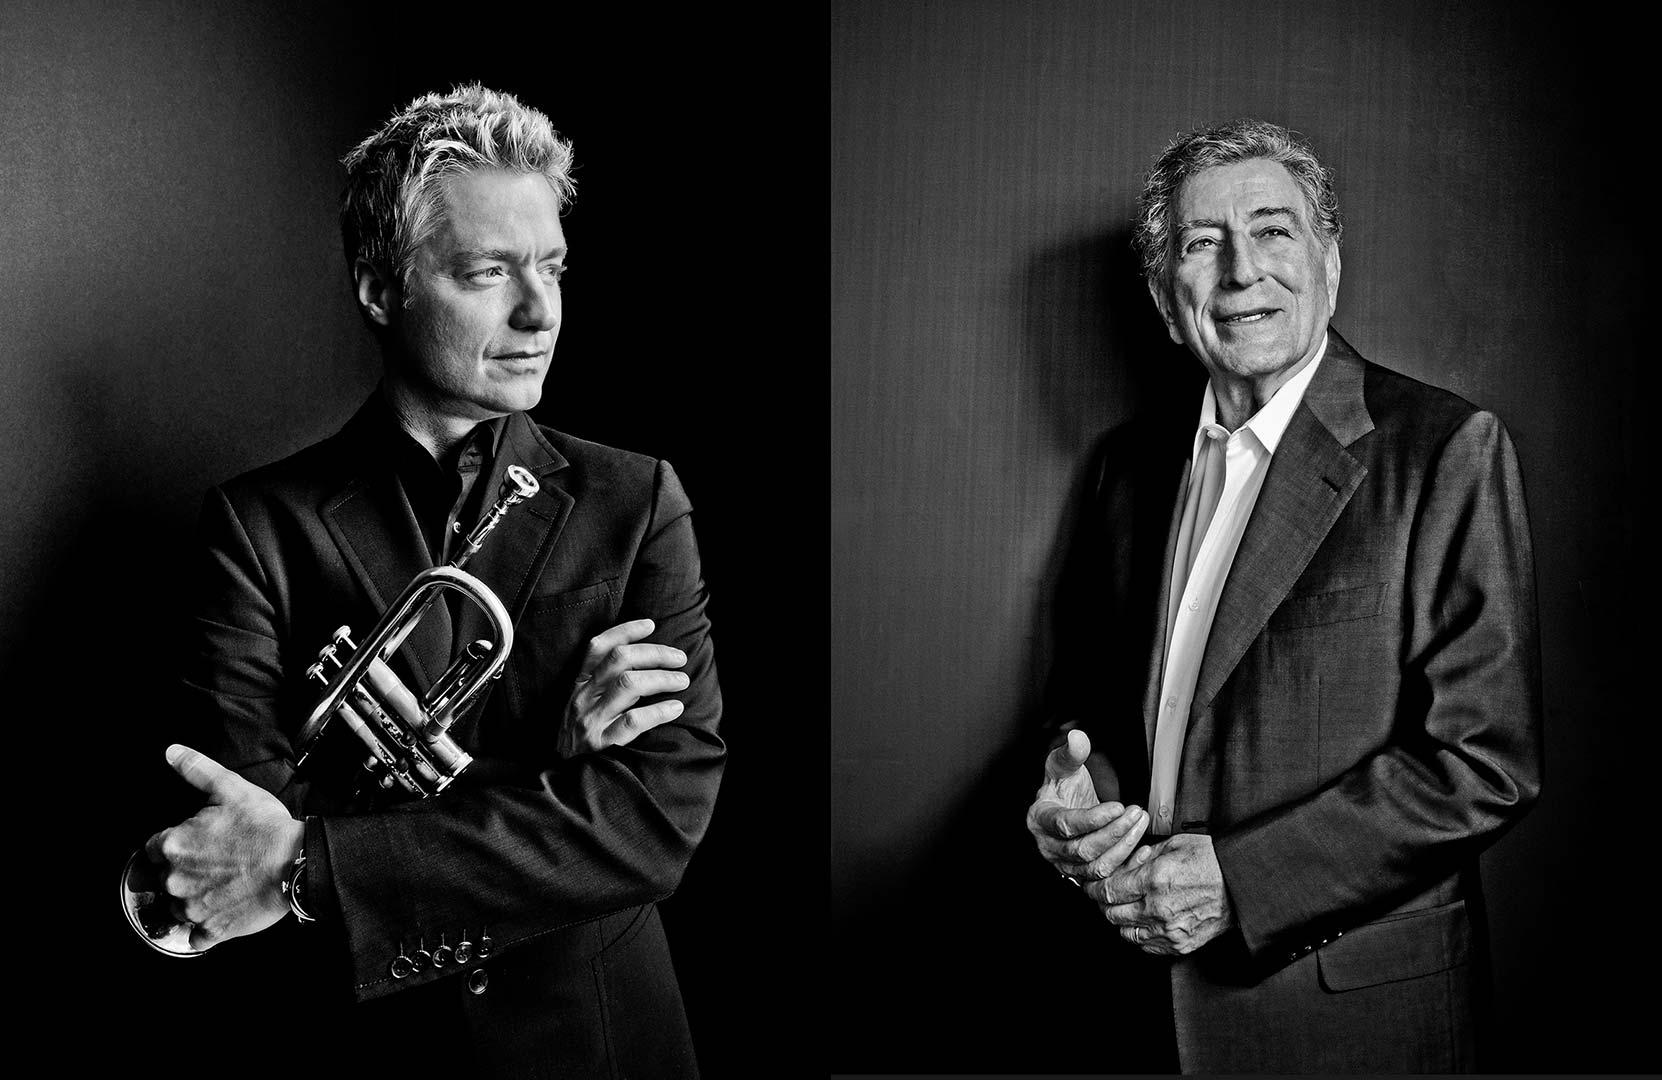 black & white portraits of Chris Botti and Tony Bennett